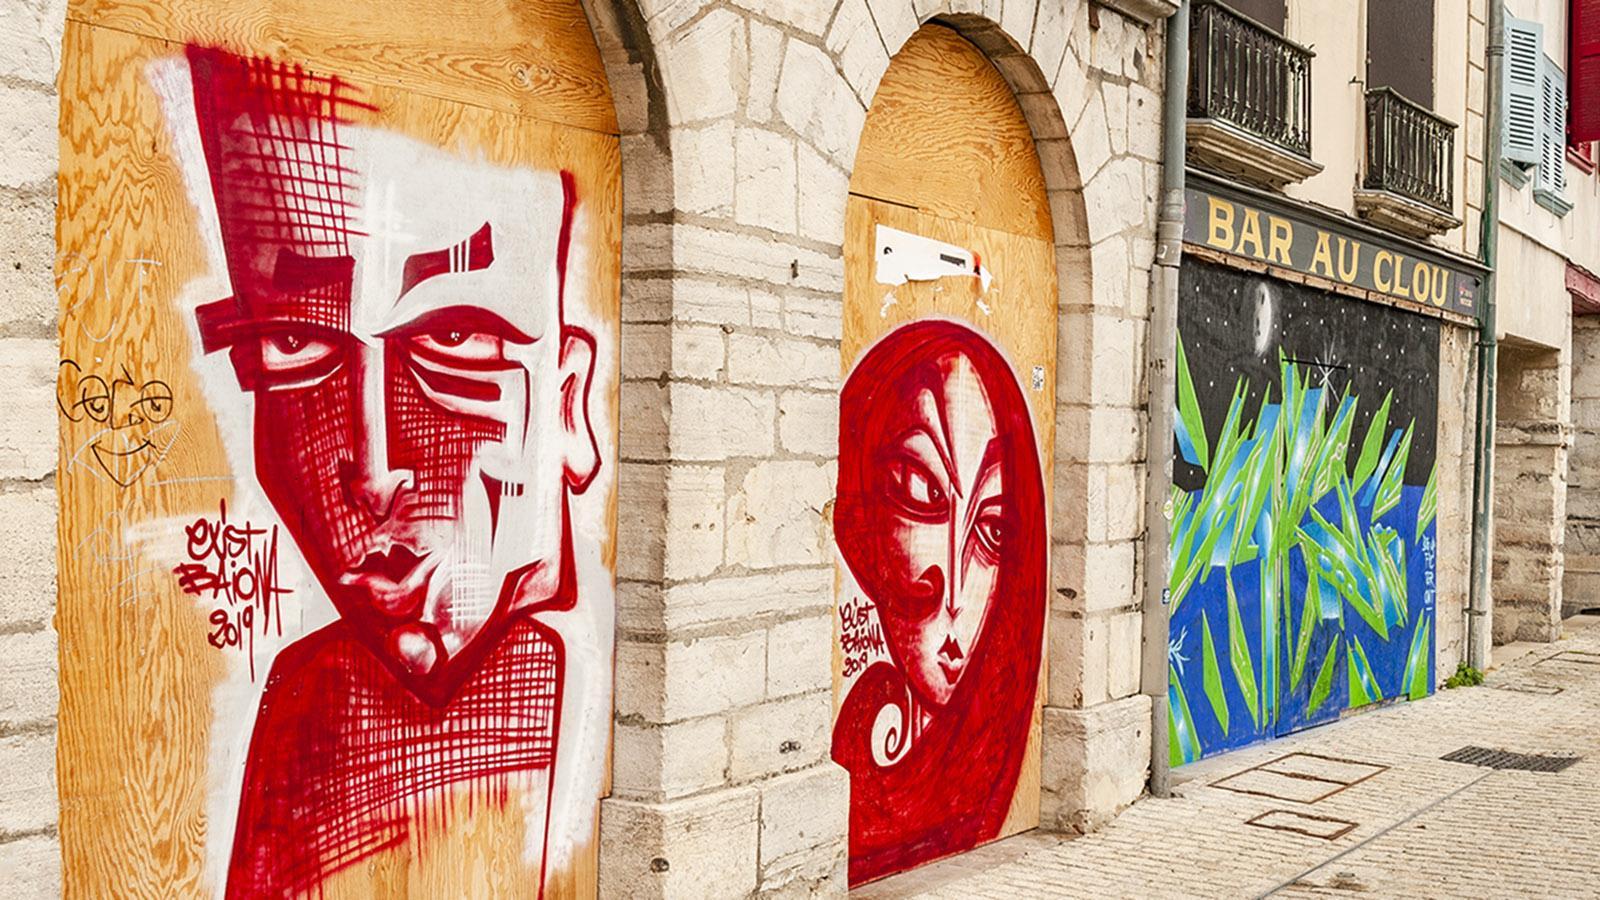 Street Art in Bayonne. Foto: Hilke Maunder